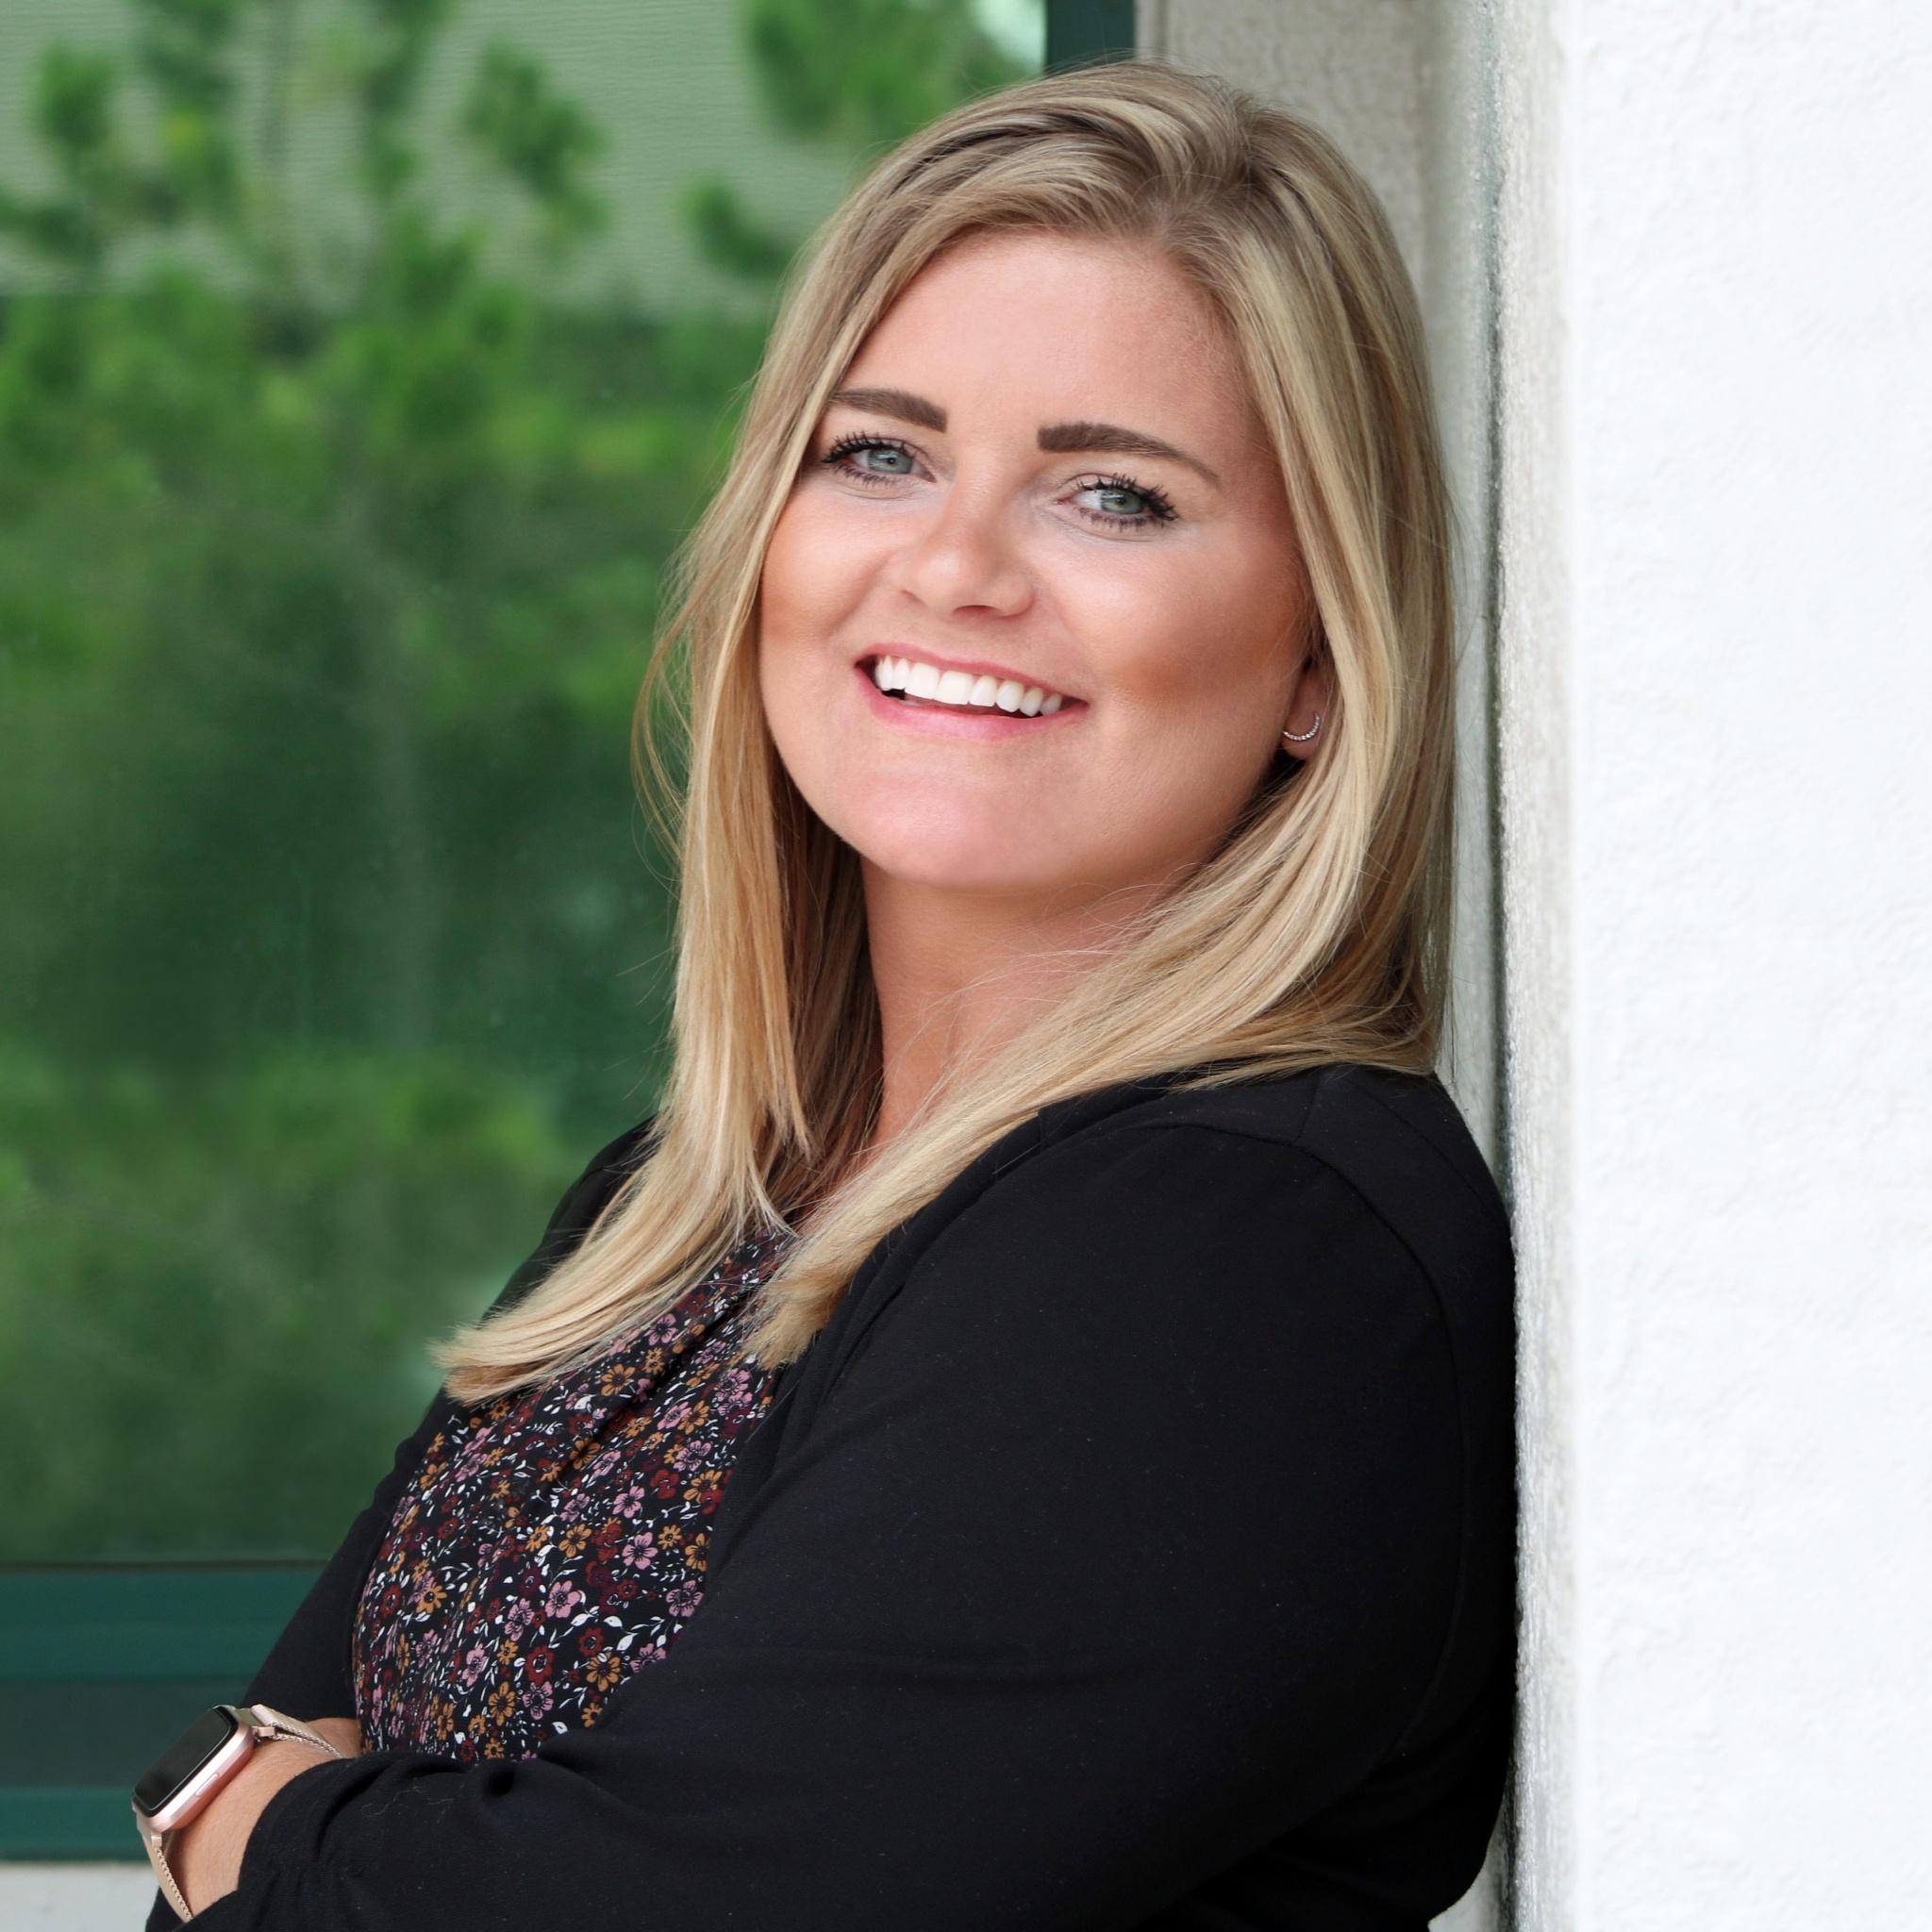 Becky Hiemstra